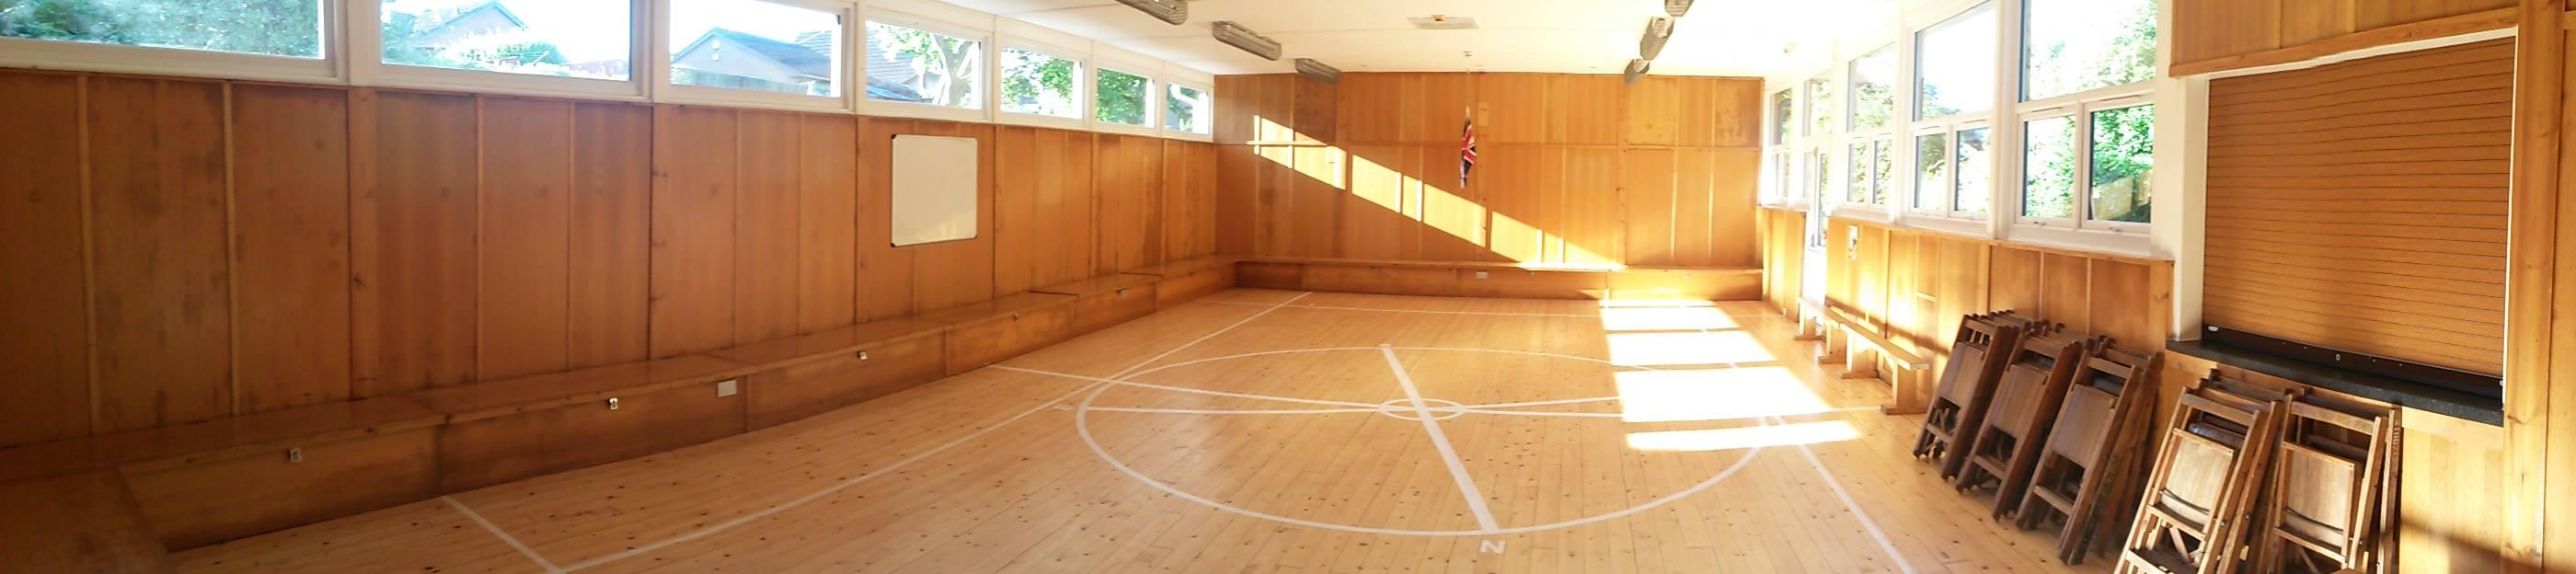 MacKinnon Hall